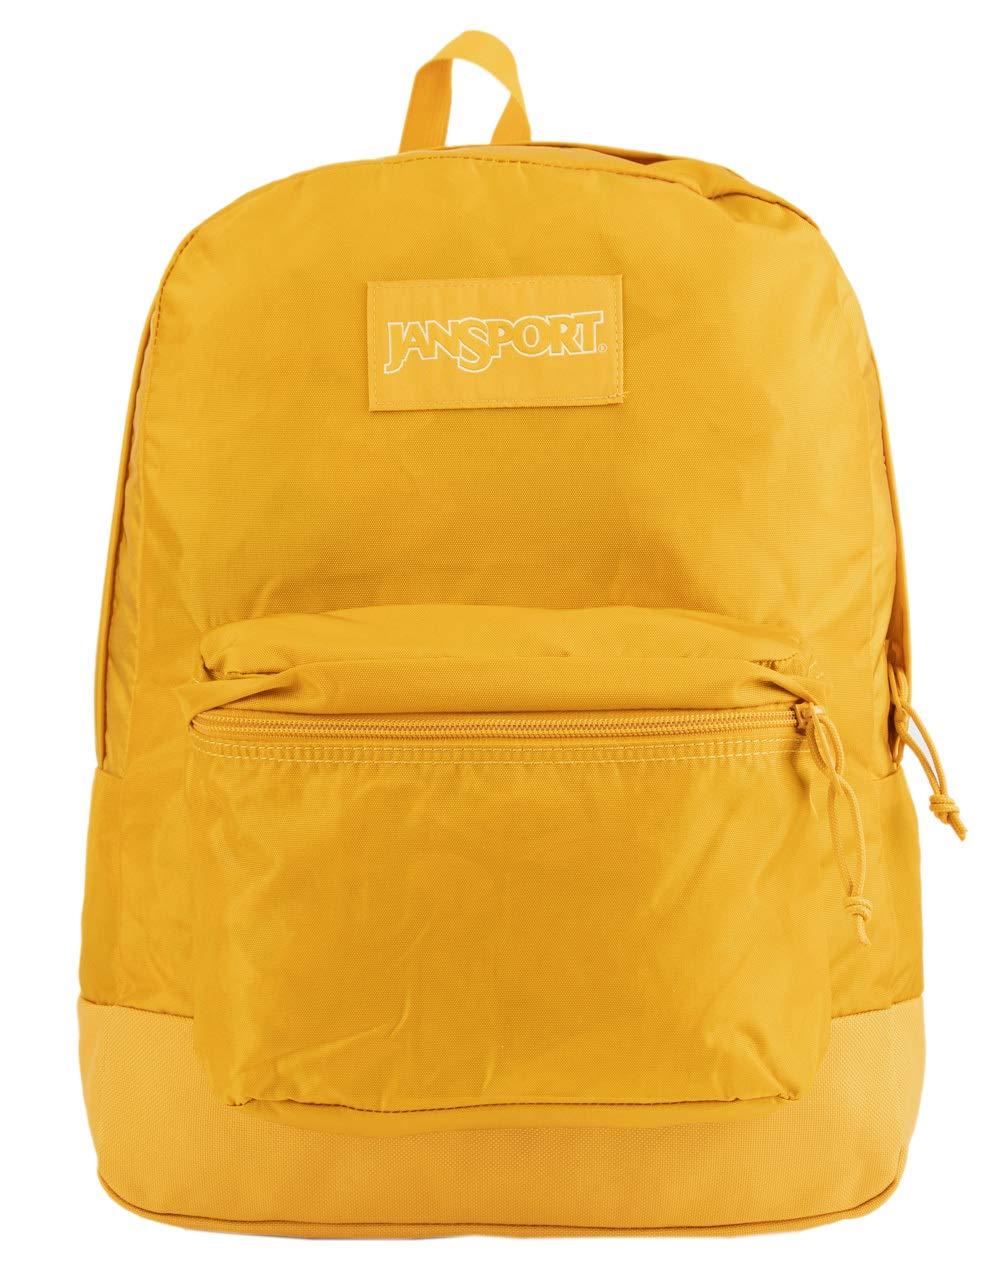 JanSport Mono Superbreak Backpack - Lightweight School Pack